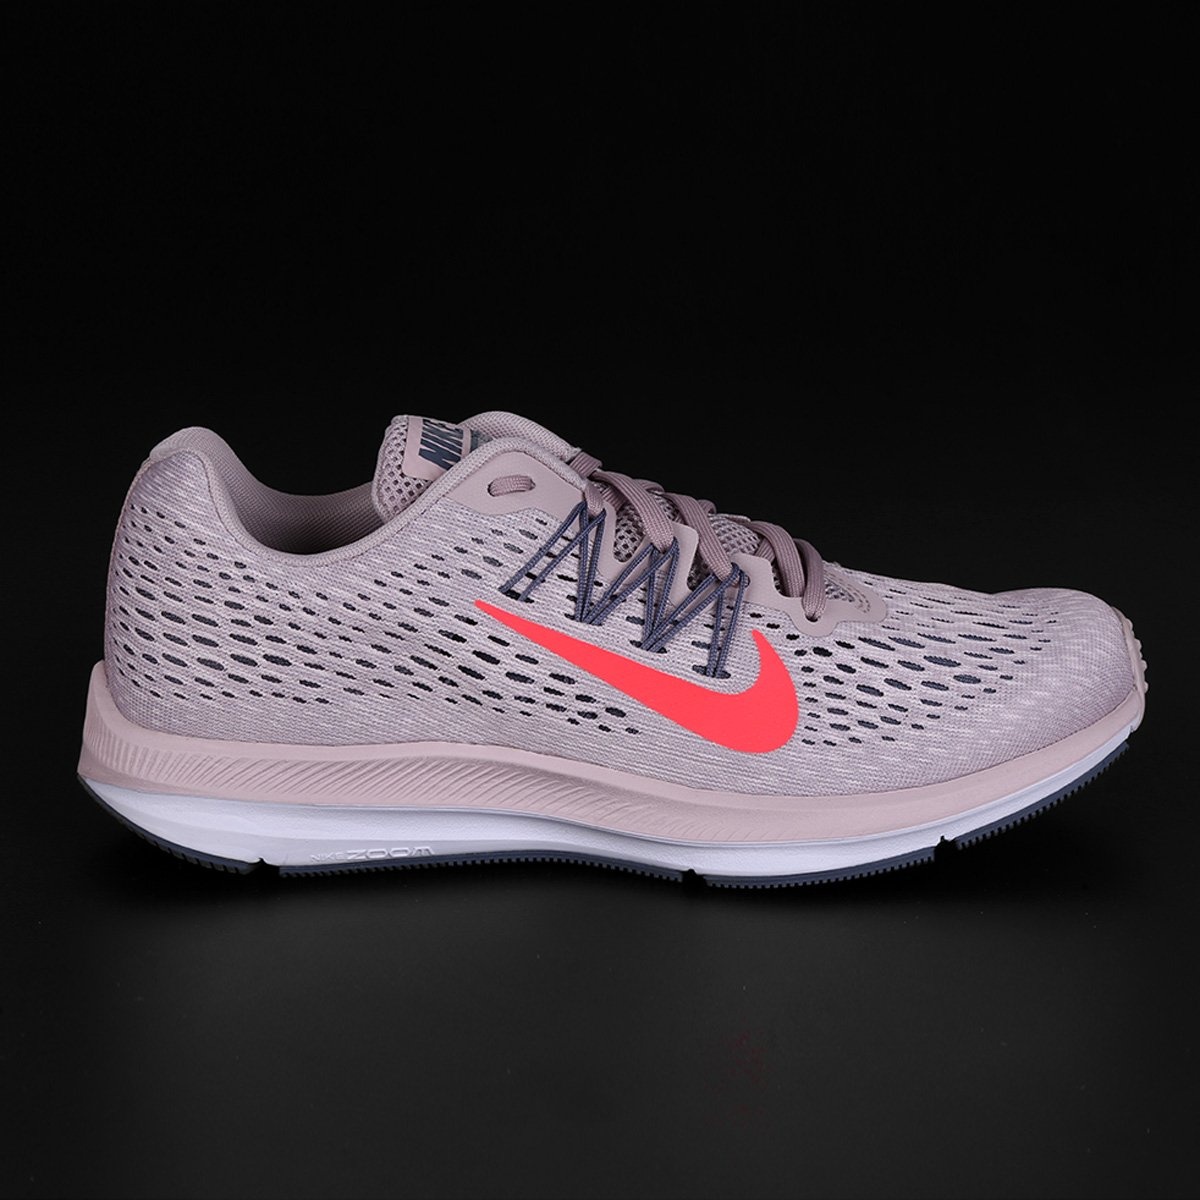 Rosa Feminino Tênis WMNS Feminino Tênis Tênis Winflo 5 Winflo 5 Zoom Nike Zoom Rosa Nike WMNS Nike XS0ZxU0n